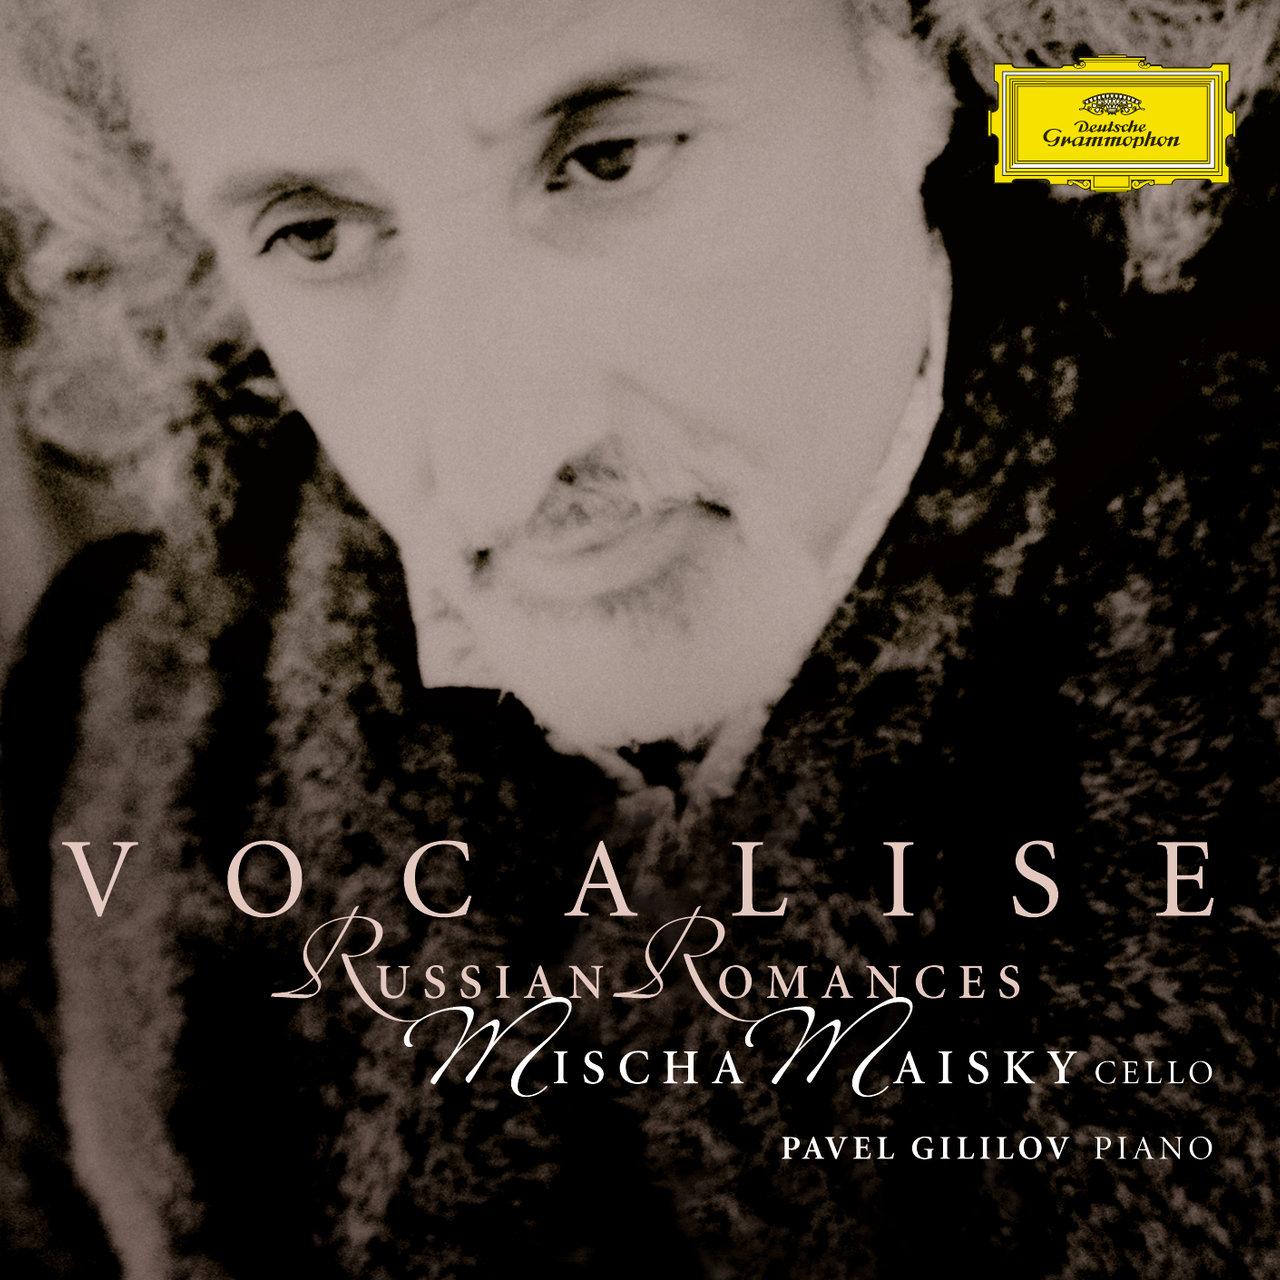 Mischa Maisky, Pavel Gililov - Vocalise: Russian Romances (2006) (Repost)